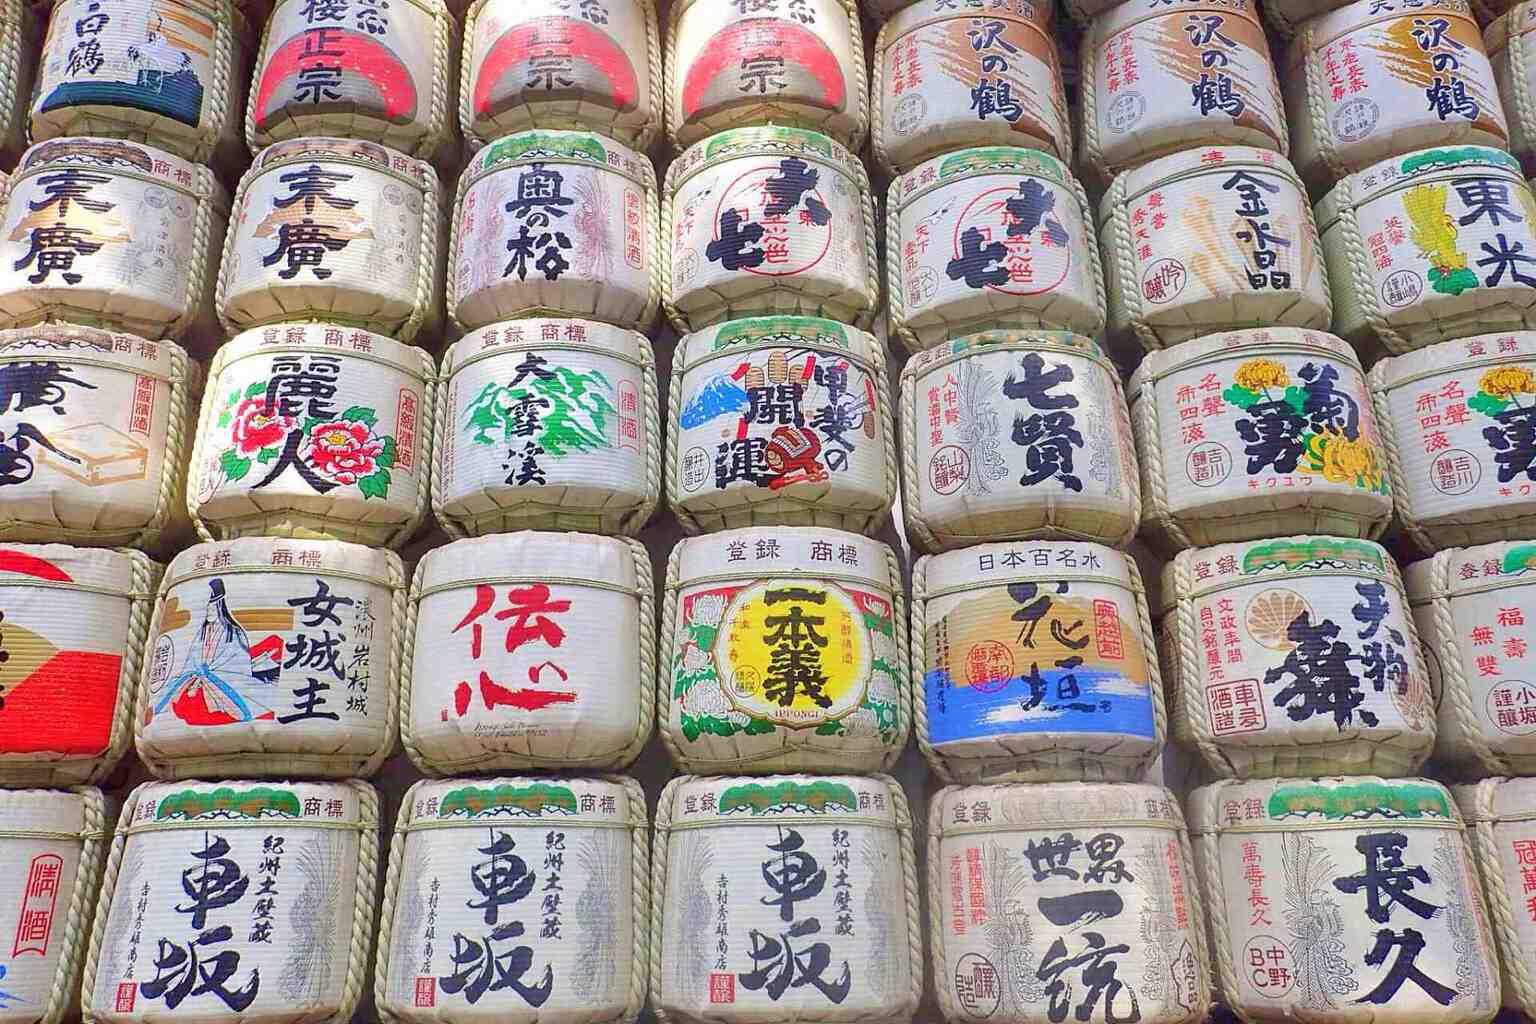 Exploring Tokyo: A Budget Travel Guide